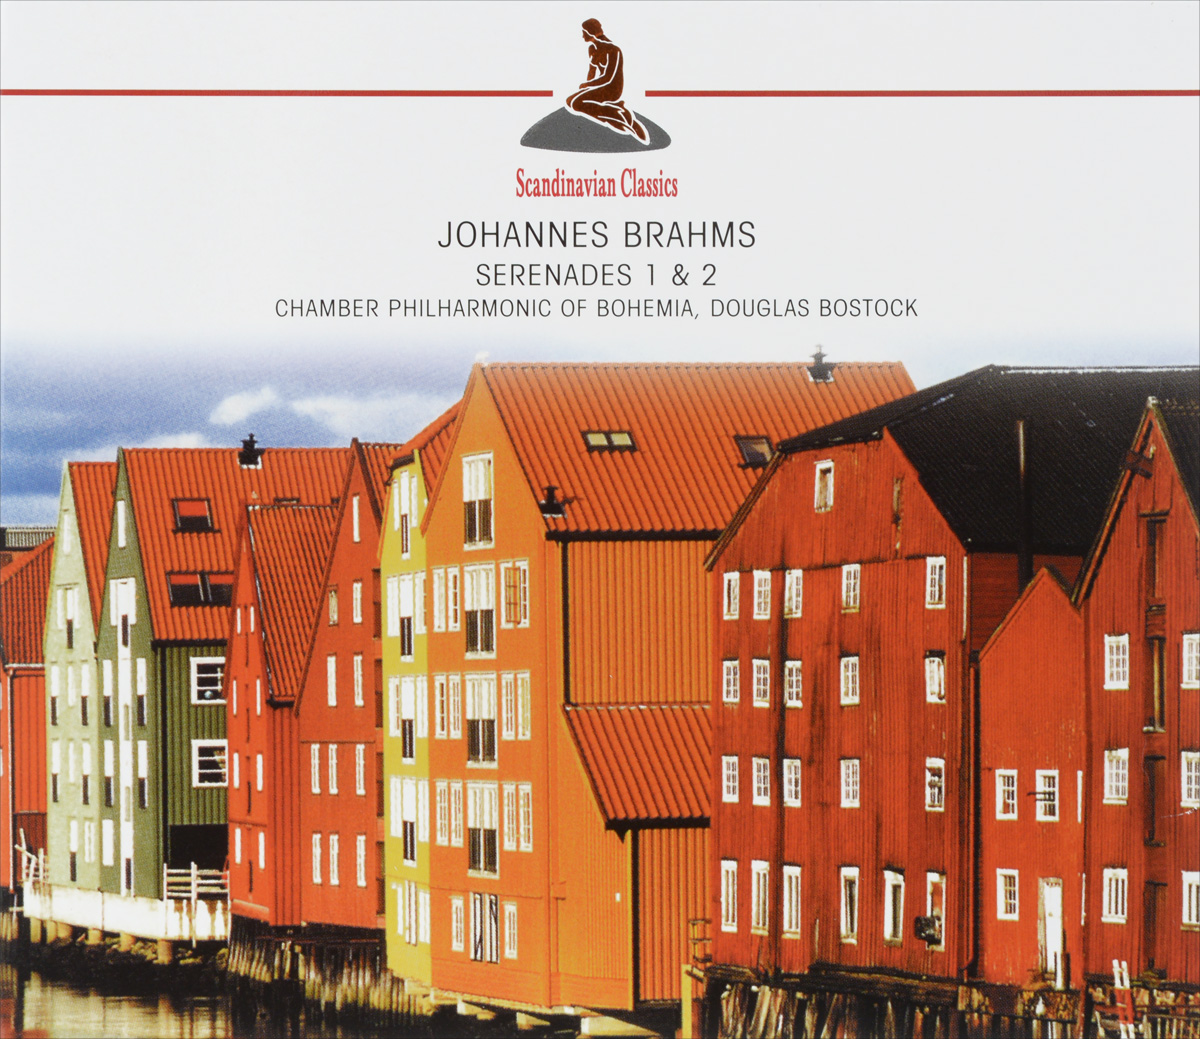 Дуглас Босток,Chamber Philharmonic Of Bohemia Scandinavian Classics. Douglas Bostock, Chamber Philharmonic Of Bohemia. Johannes Brahms. Serenades 1 & 2 тону кэлжуст estonian philharmonic chamber choir arvo part kanon pokajanen 2 cd